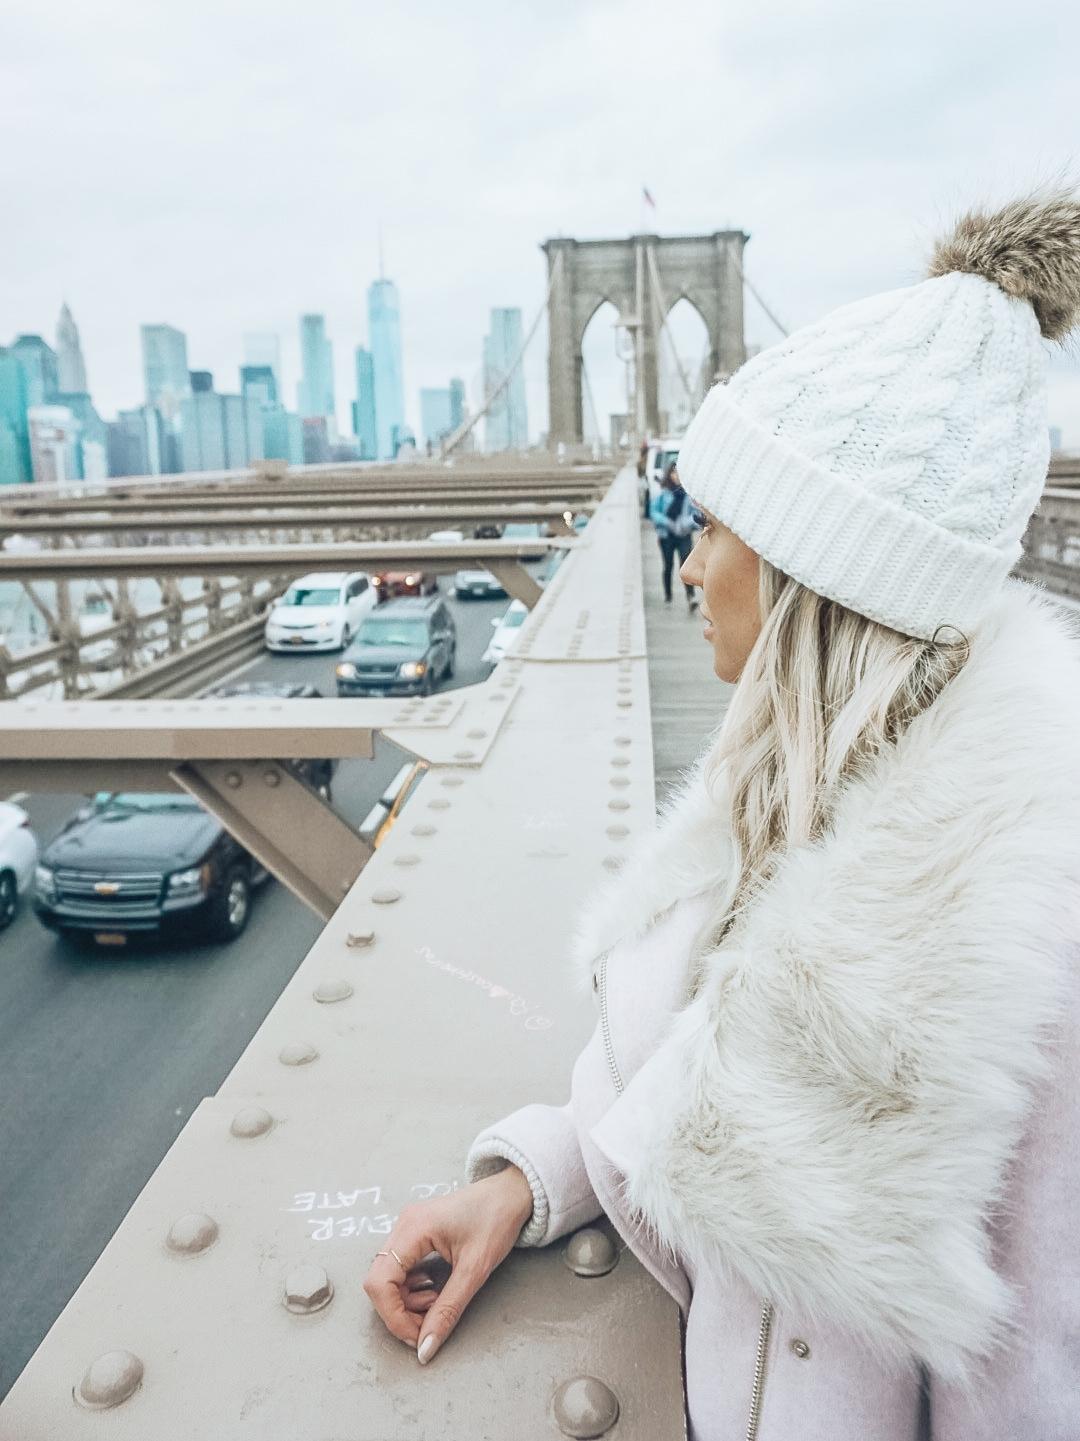 brooklyn bridge stare.jpg